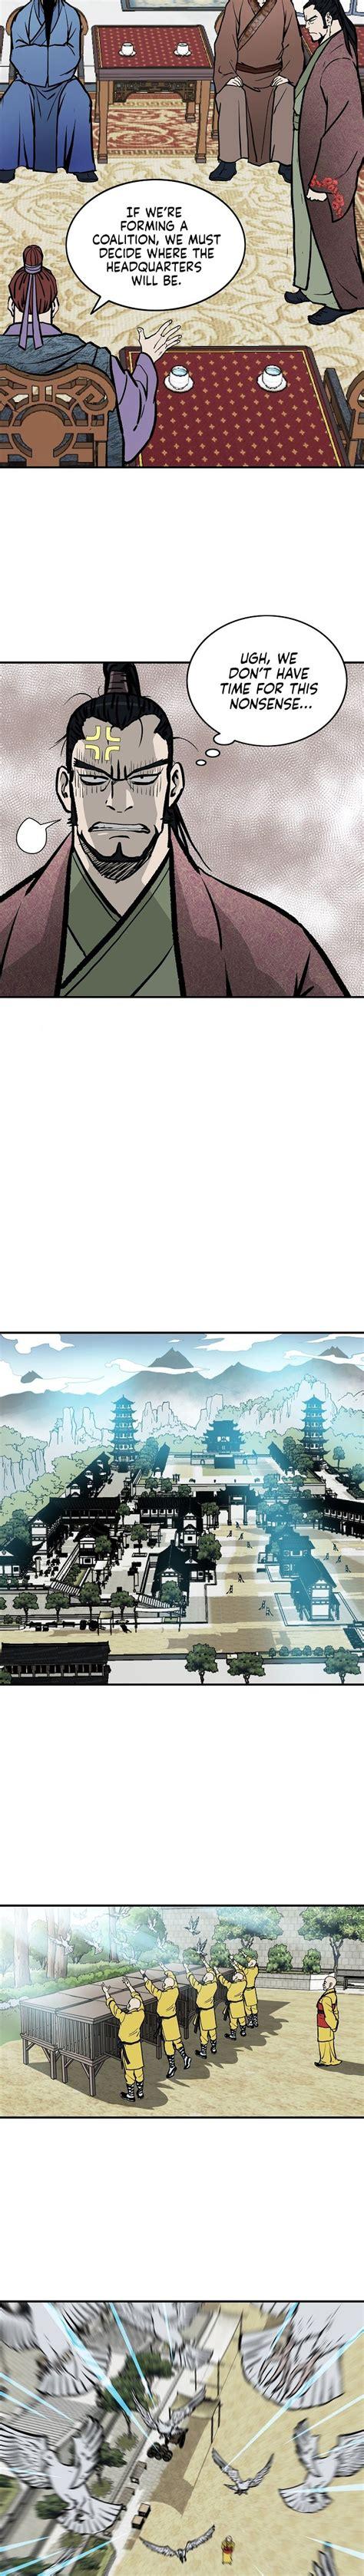 Apr 02, 2020 · simon's bowblade is a trick weapon in bloodborne. Bowblade Spirit - Chapter 27 - Manga Rock Team - Read Manga Online For Free